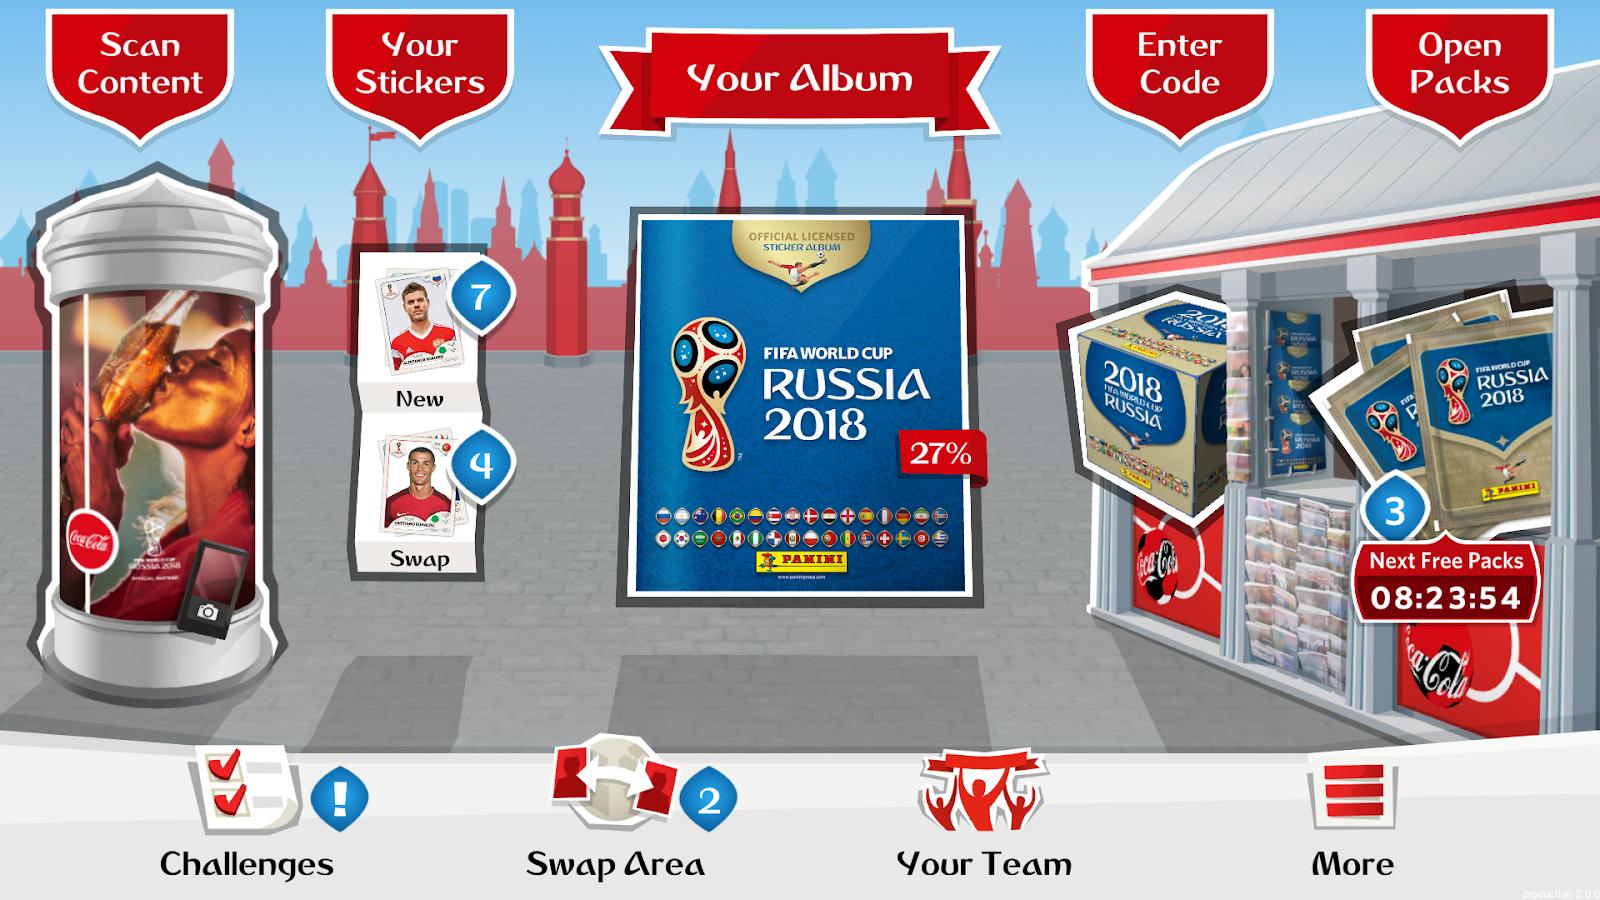 FIFA WORLD CUP RUSSIA 2018 Panini Online Sticker Album - Android app